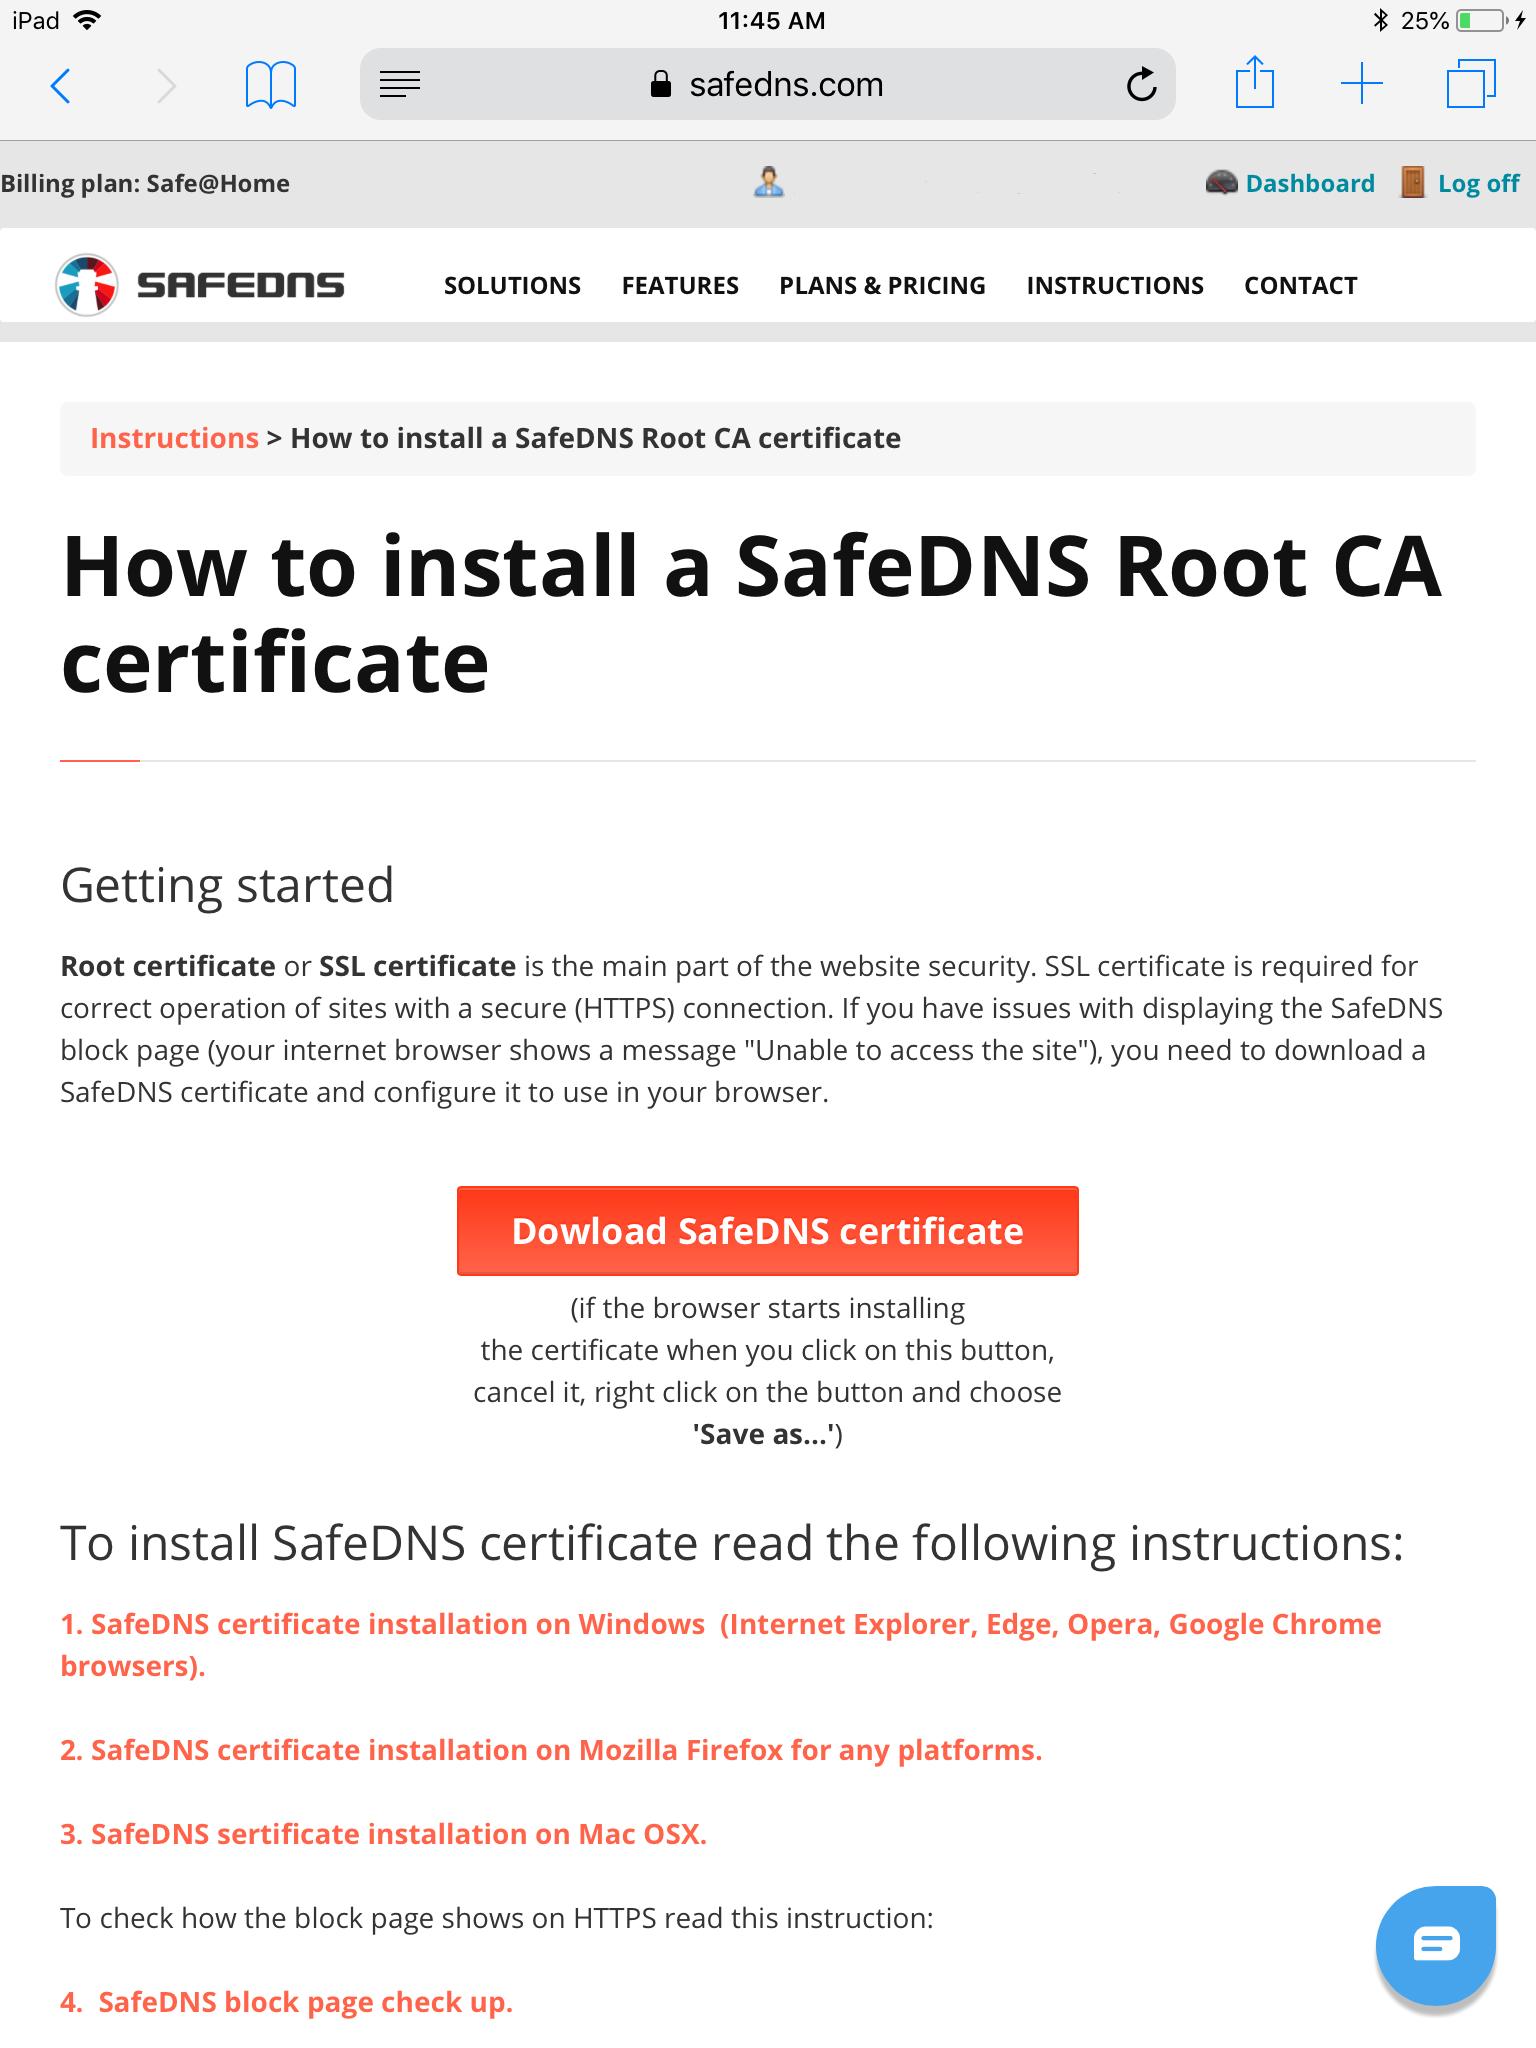 Dowload SafeDNS certificate